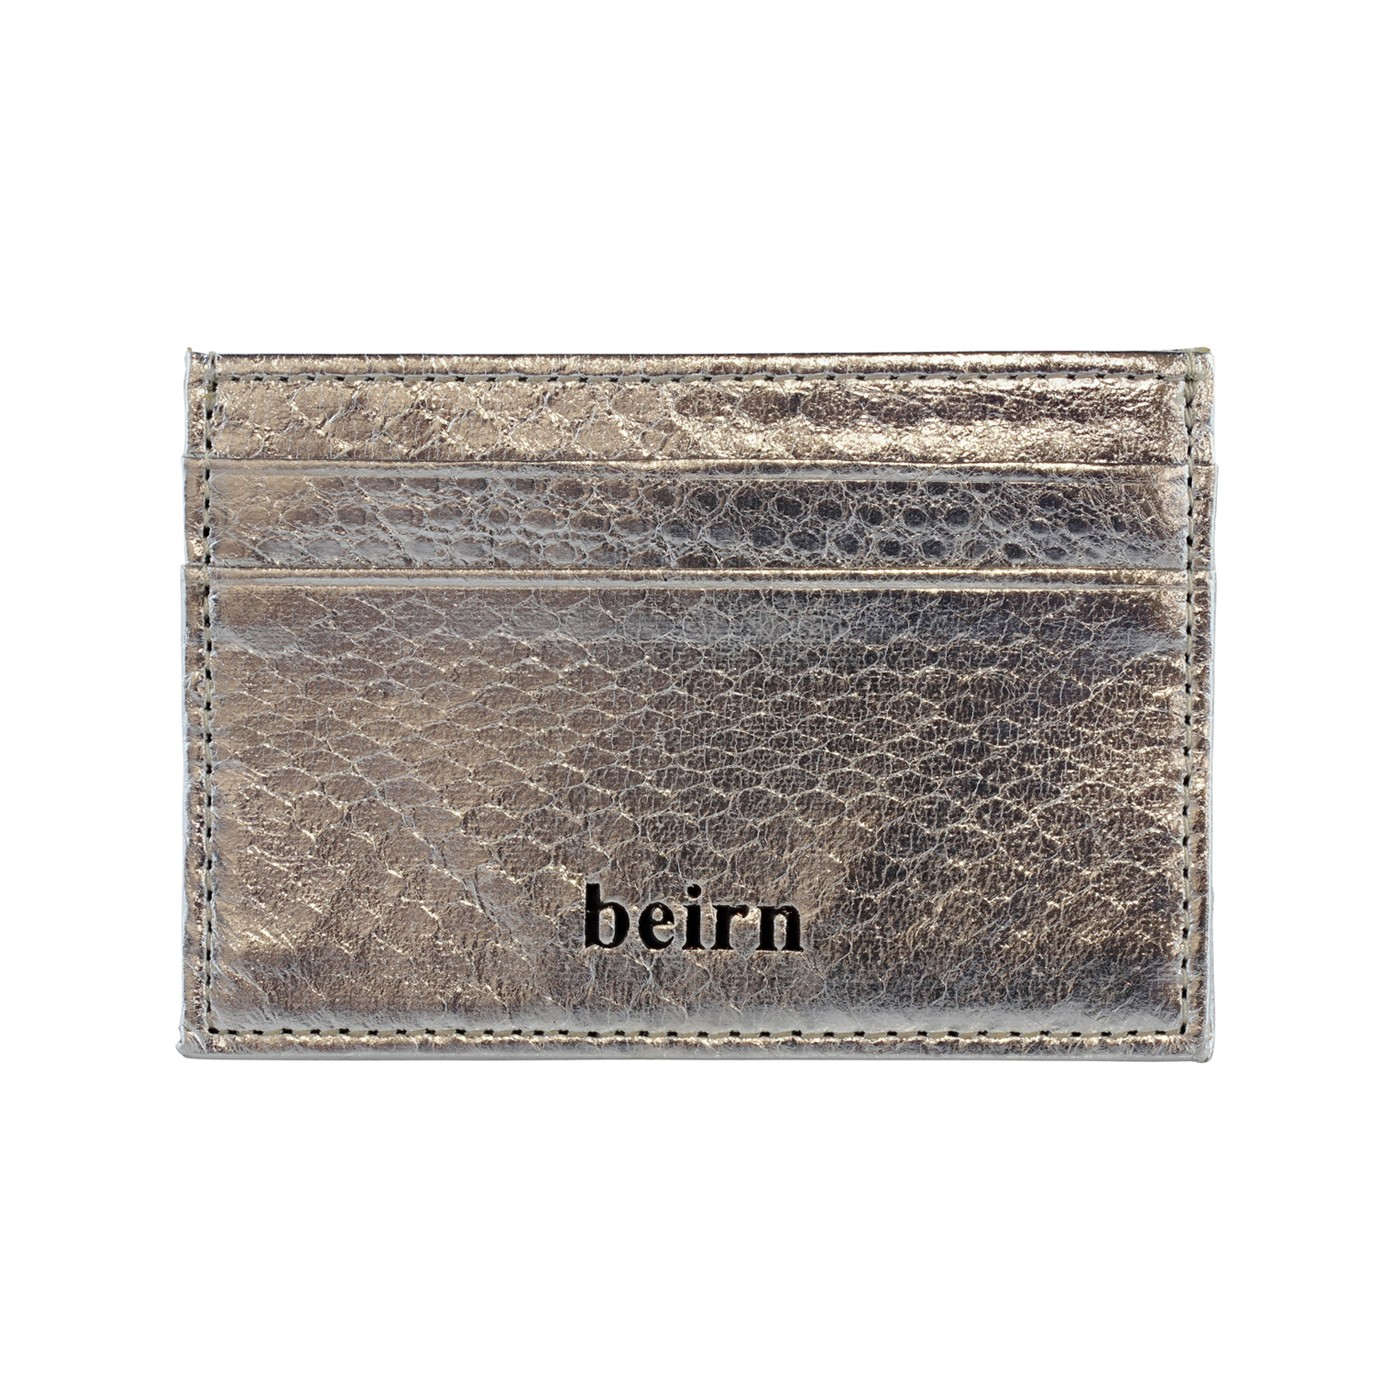 7b3ea3b385b1 Credit Card Case V2 Water Snake   Shop Snakeskin Handbags